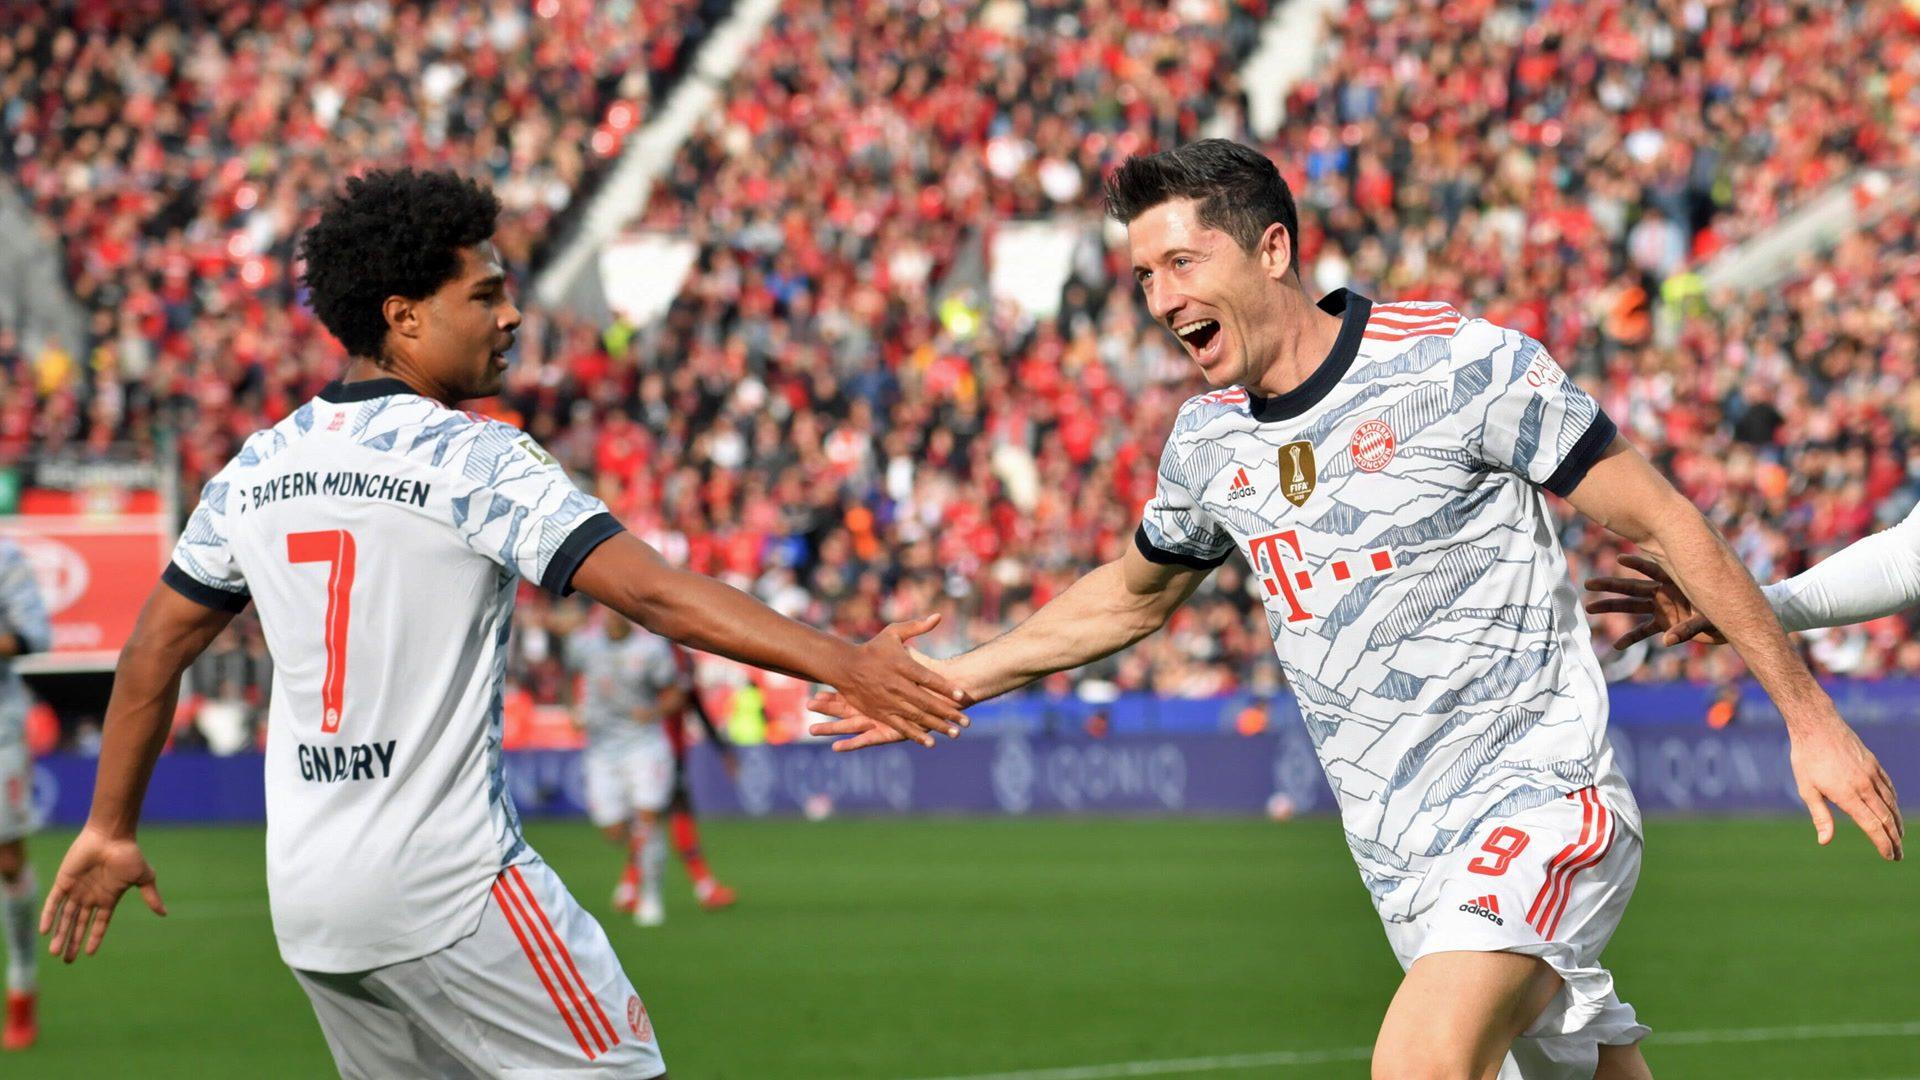 Lewandowski and Gnabry double up in big Bayern win